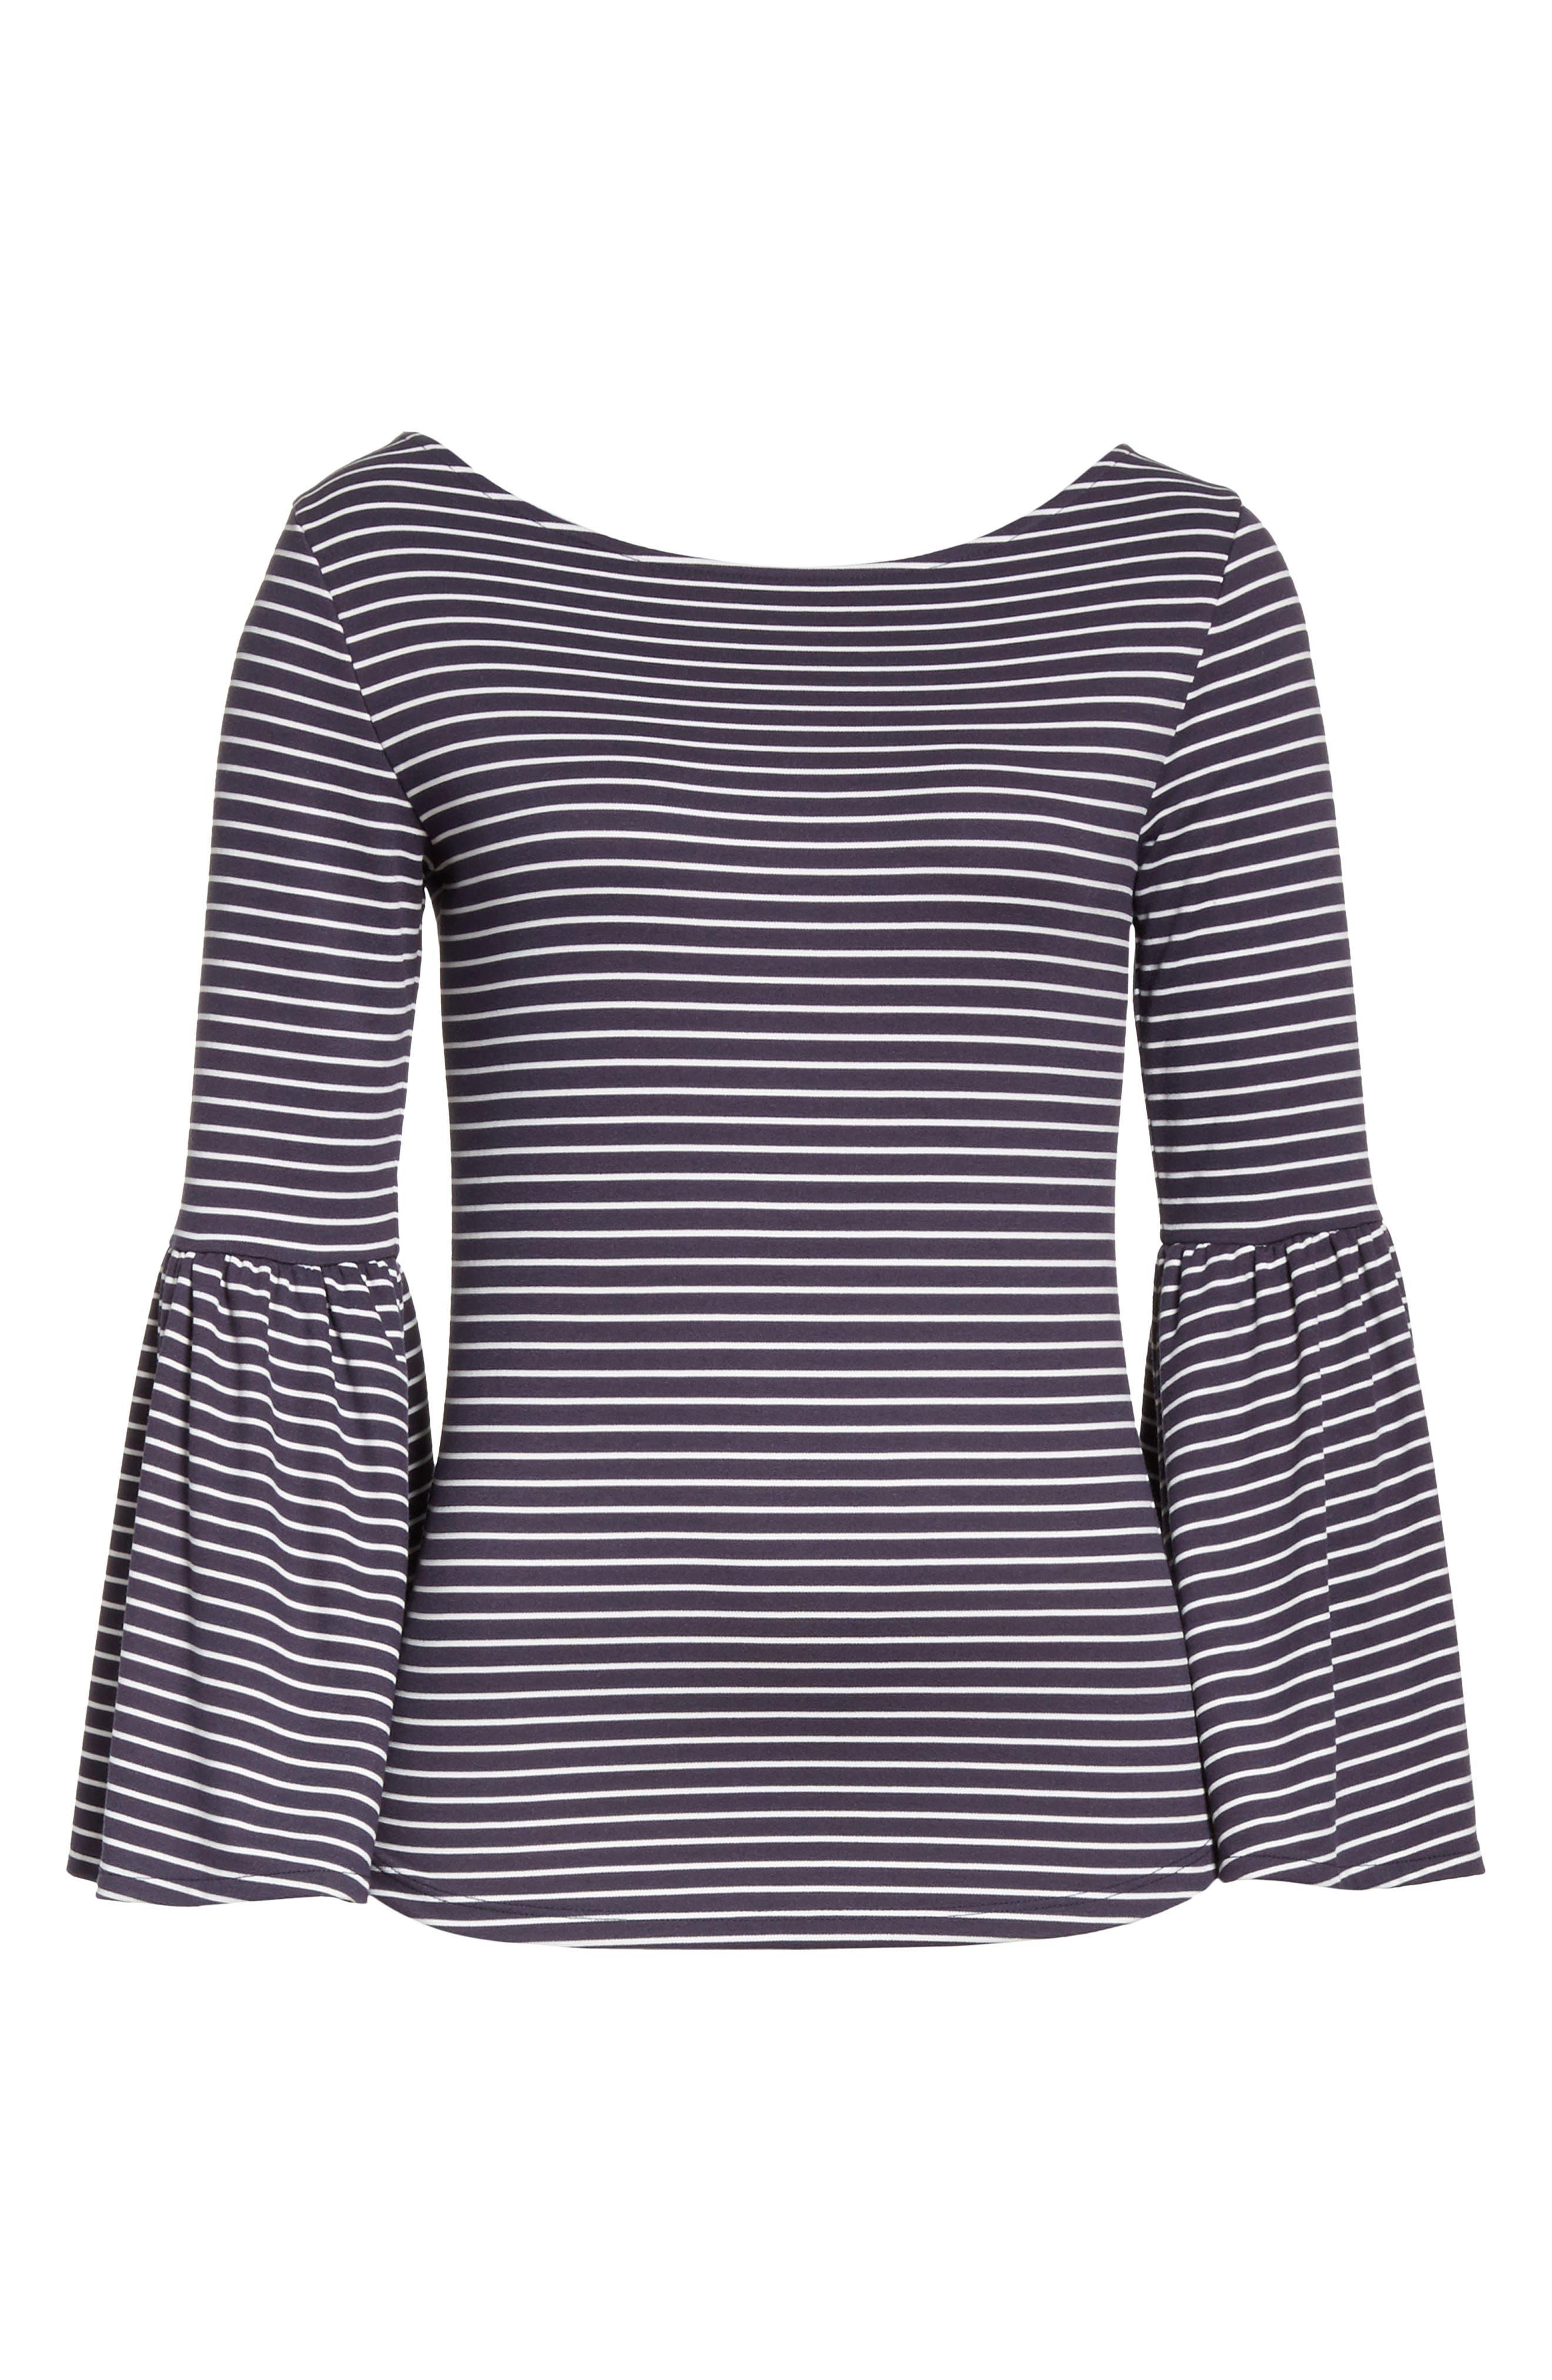 Stripe Bell Sleeve Top,                             Alternate thumbnail 7, color,                             Dark Navy Multi